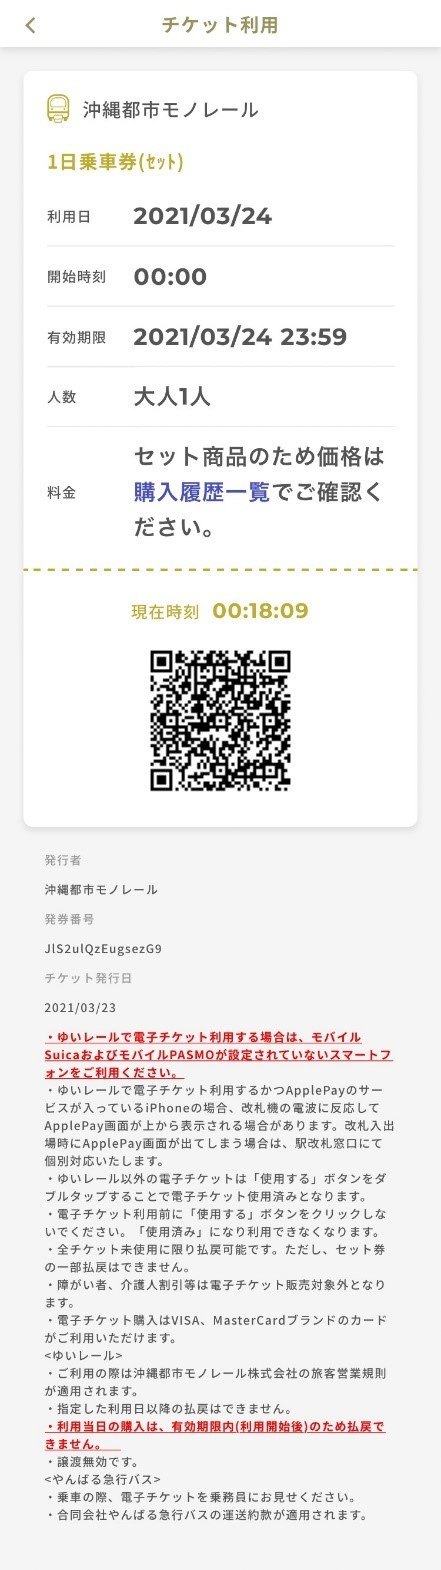 MaaS チケット利用方法 ステップ6